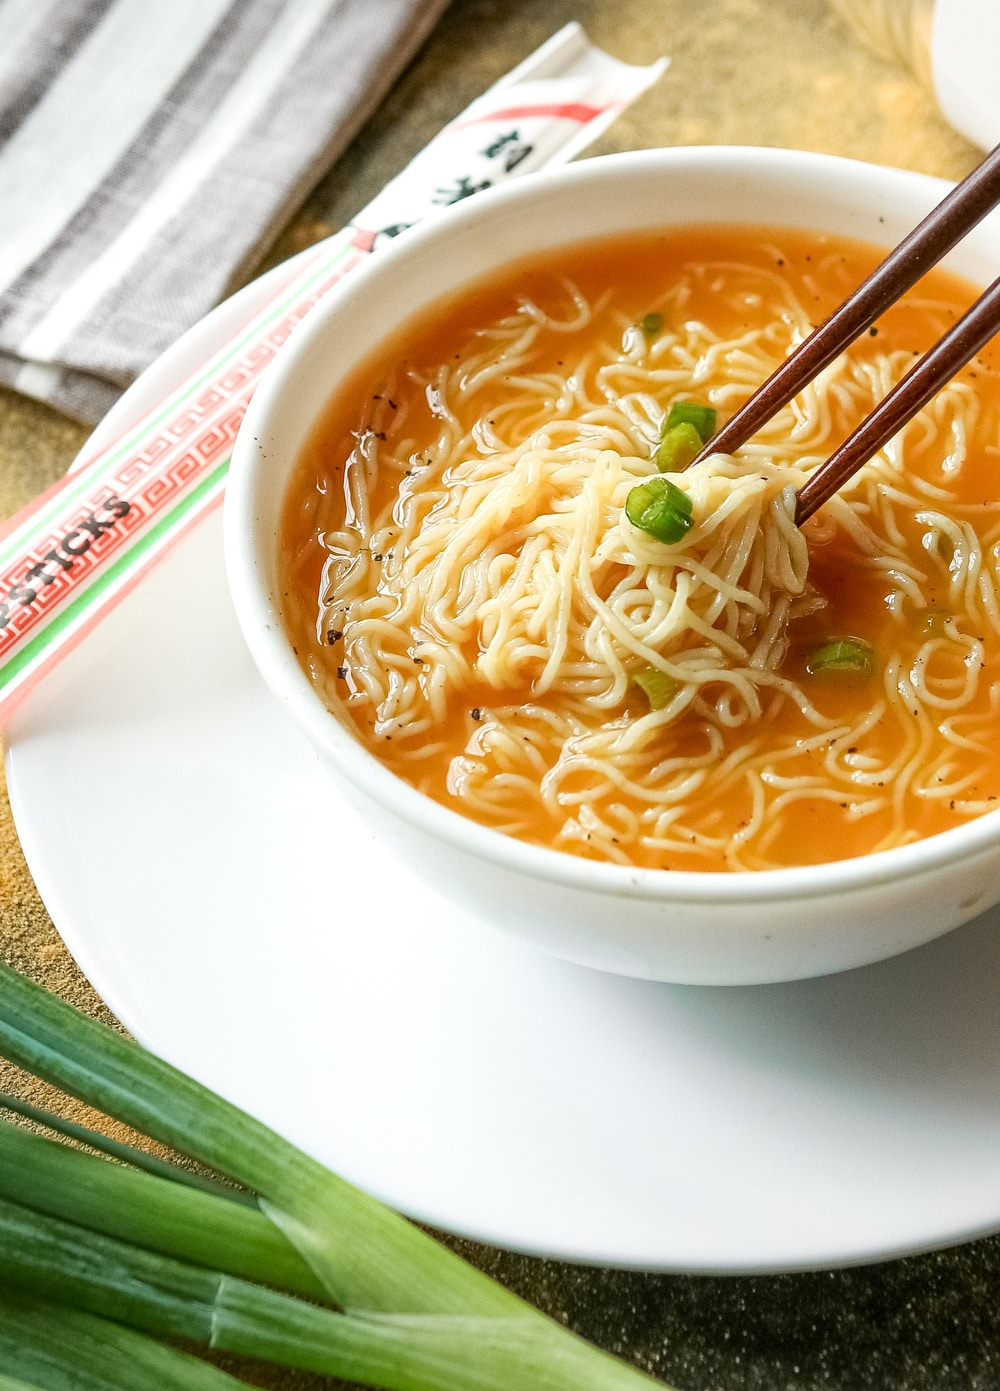 Ramen soup in a bowl with chopsticks removing noodles.